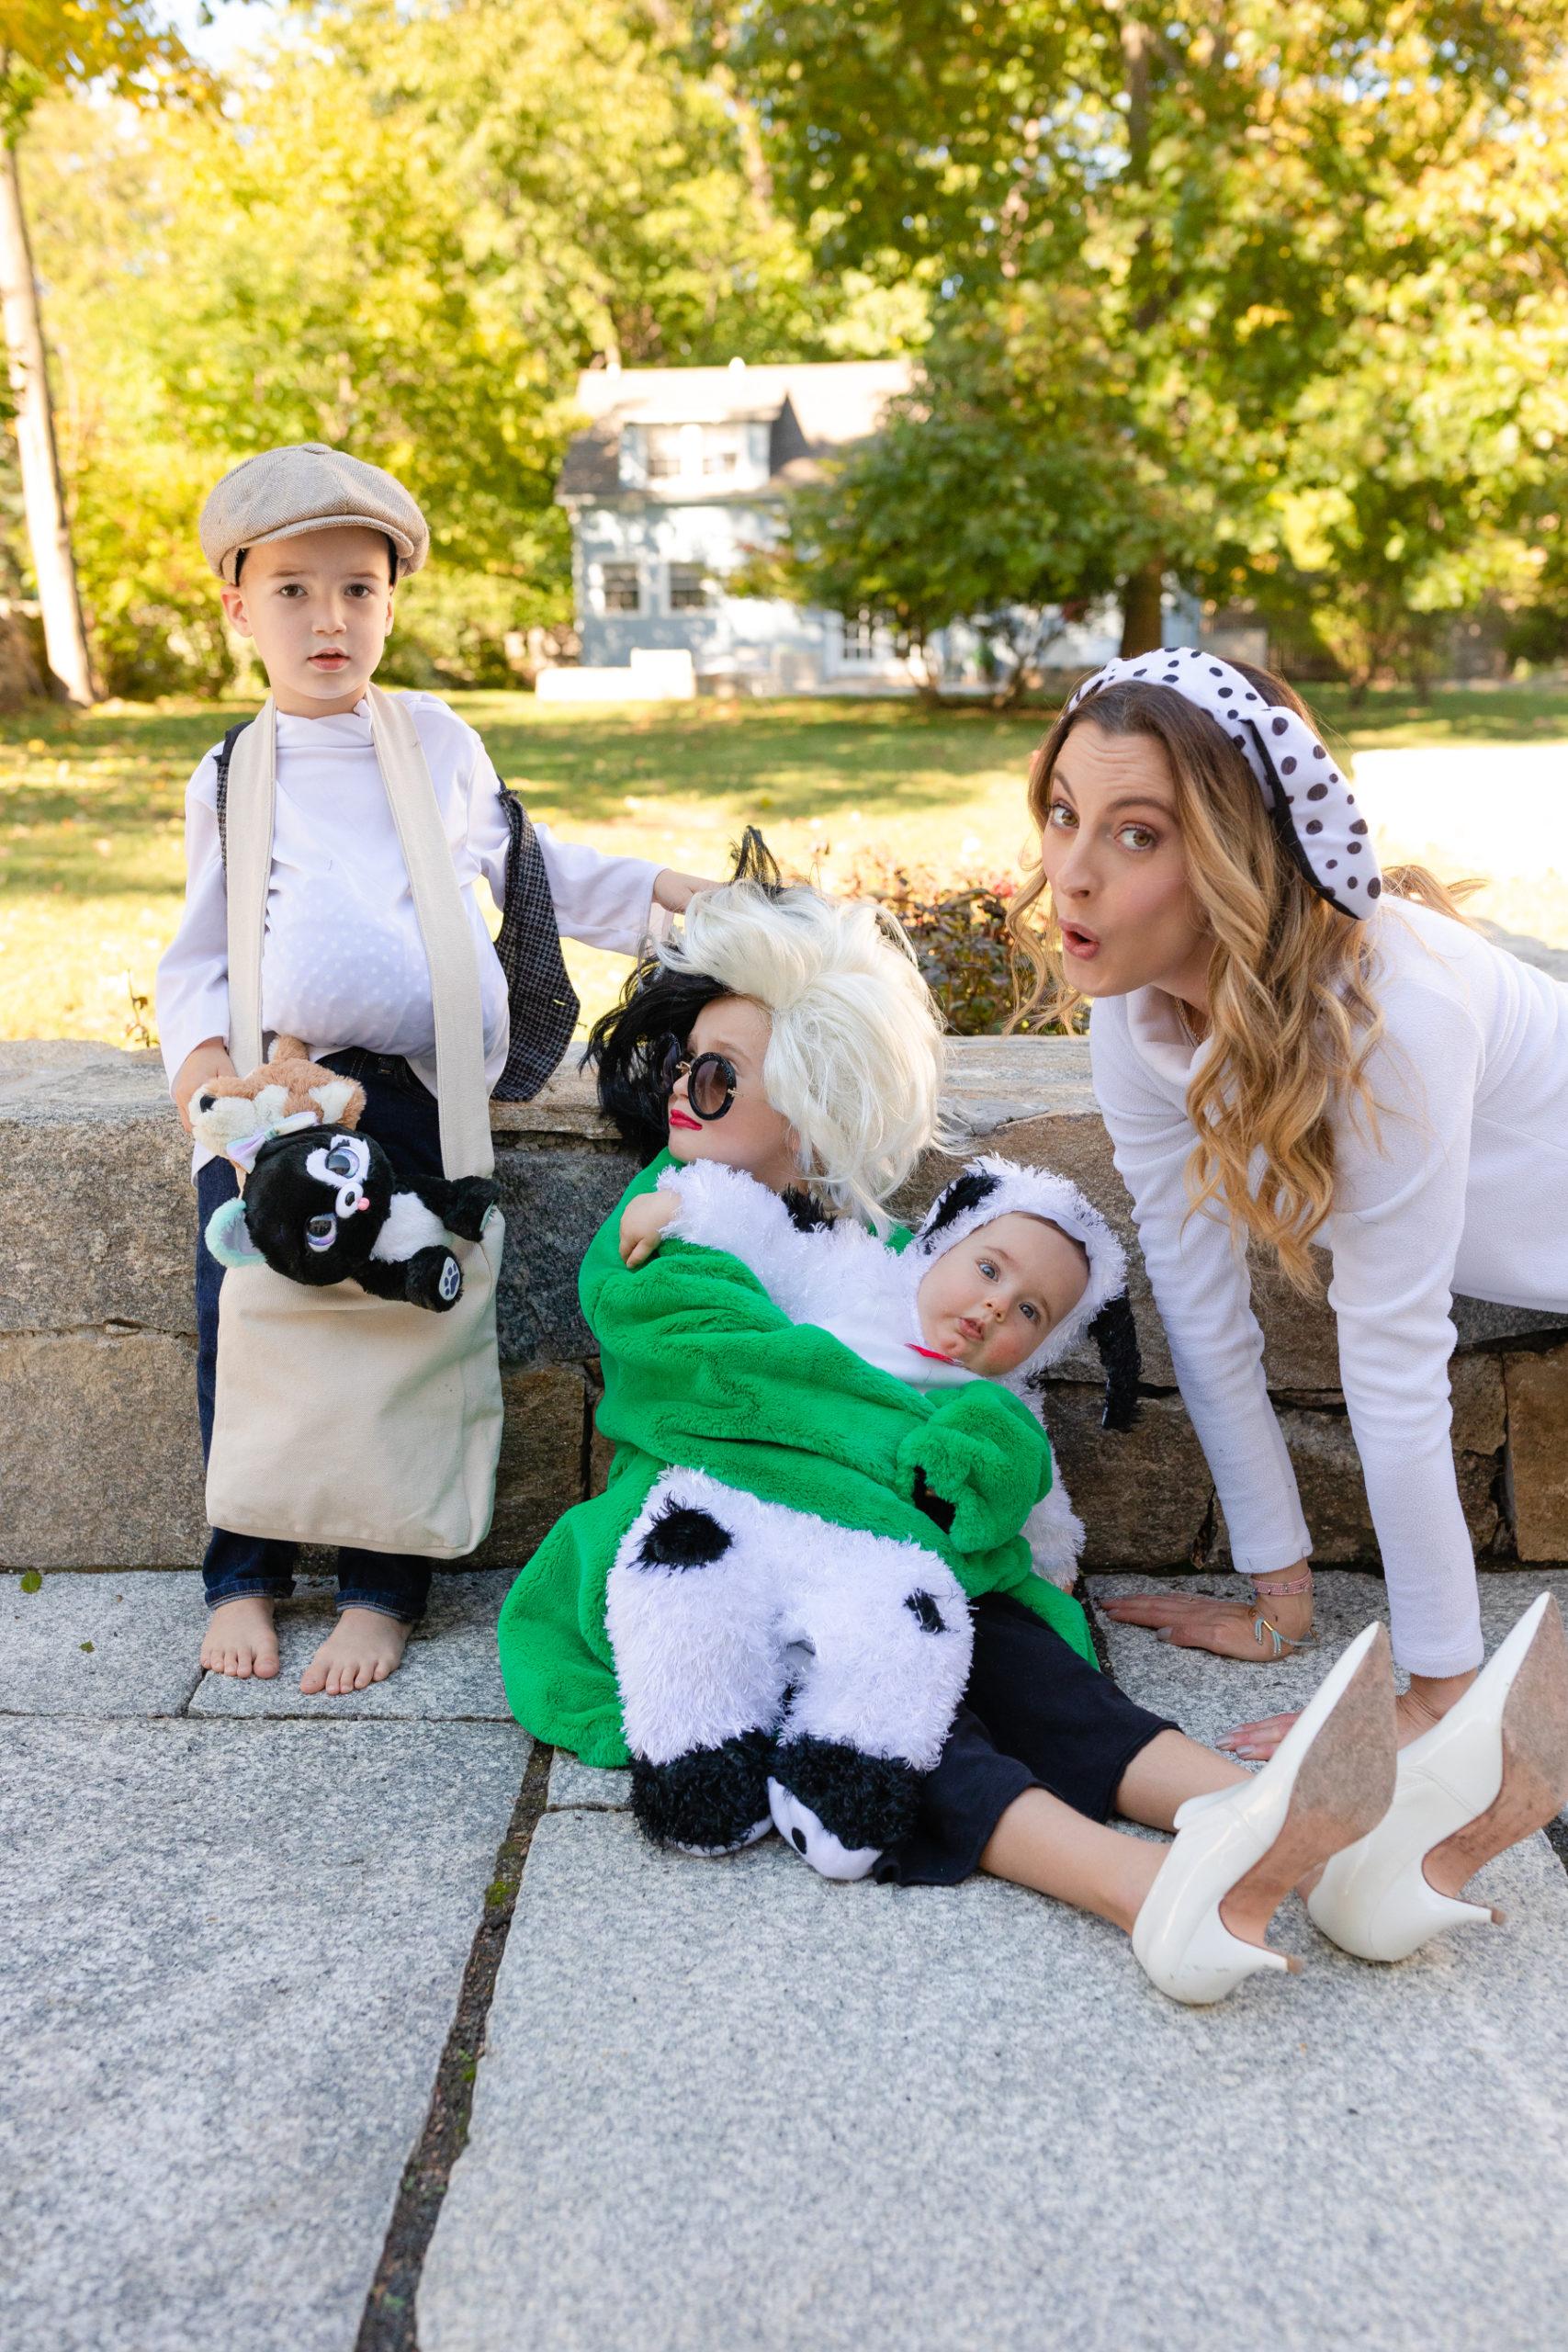 Eva Amurri shares another Family Halloween Costume idea: 101 Dalmations